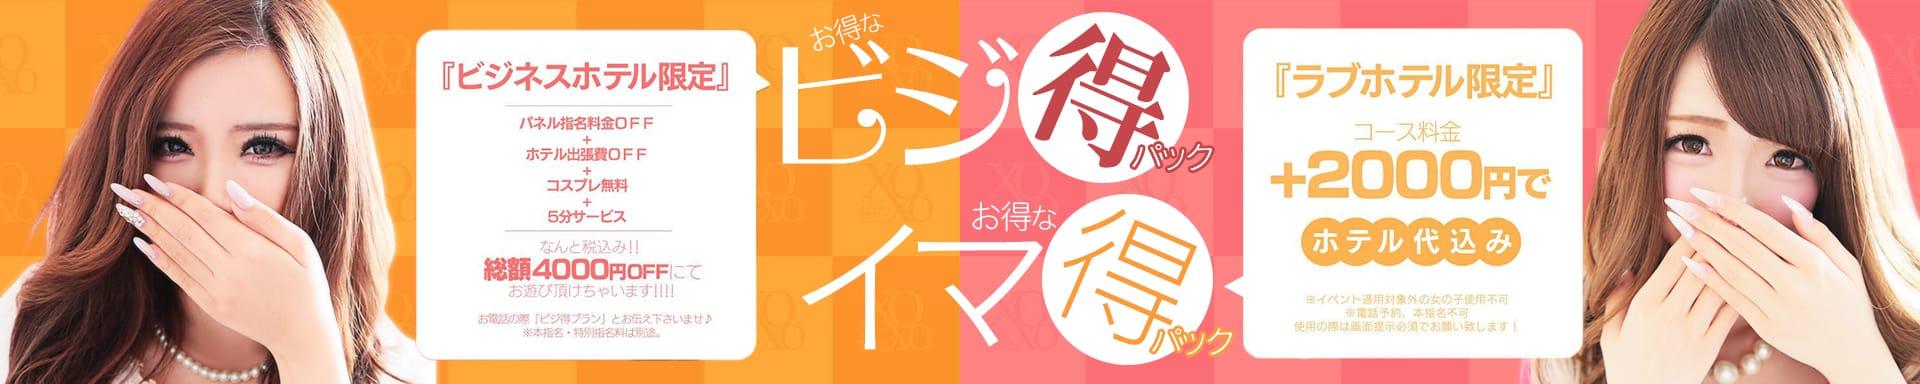 XOXO Hug&Kiss 神戸店 その3